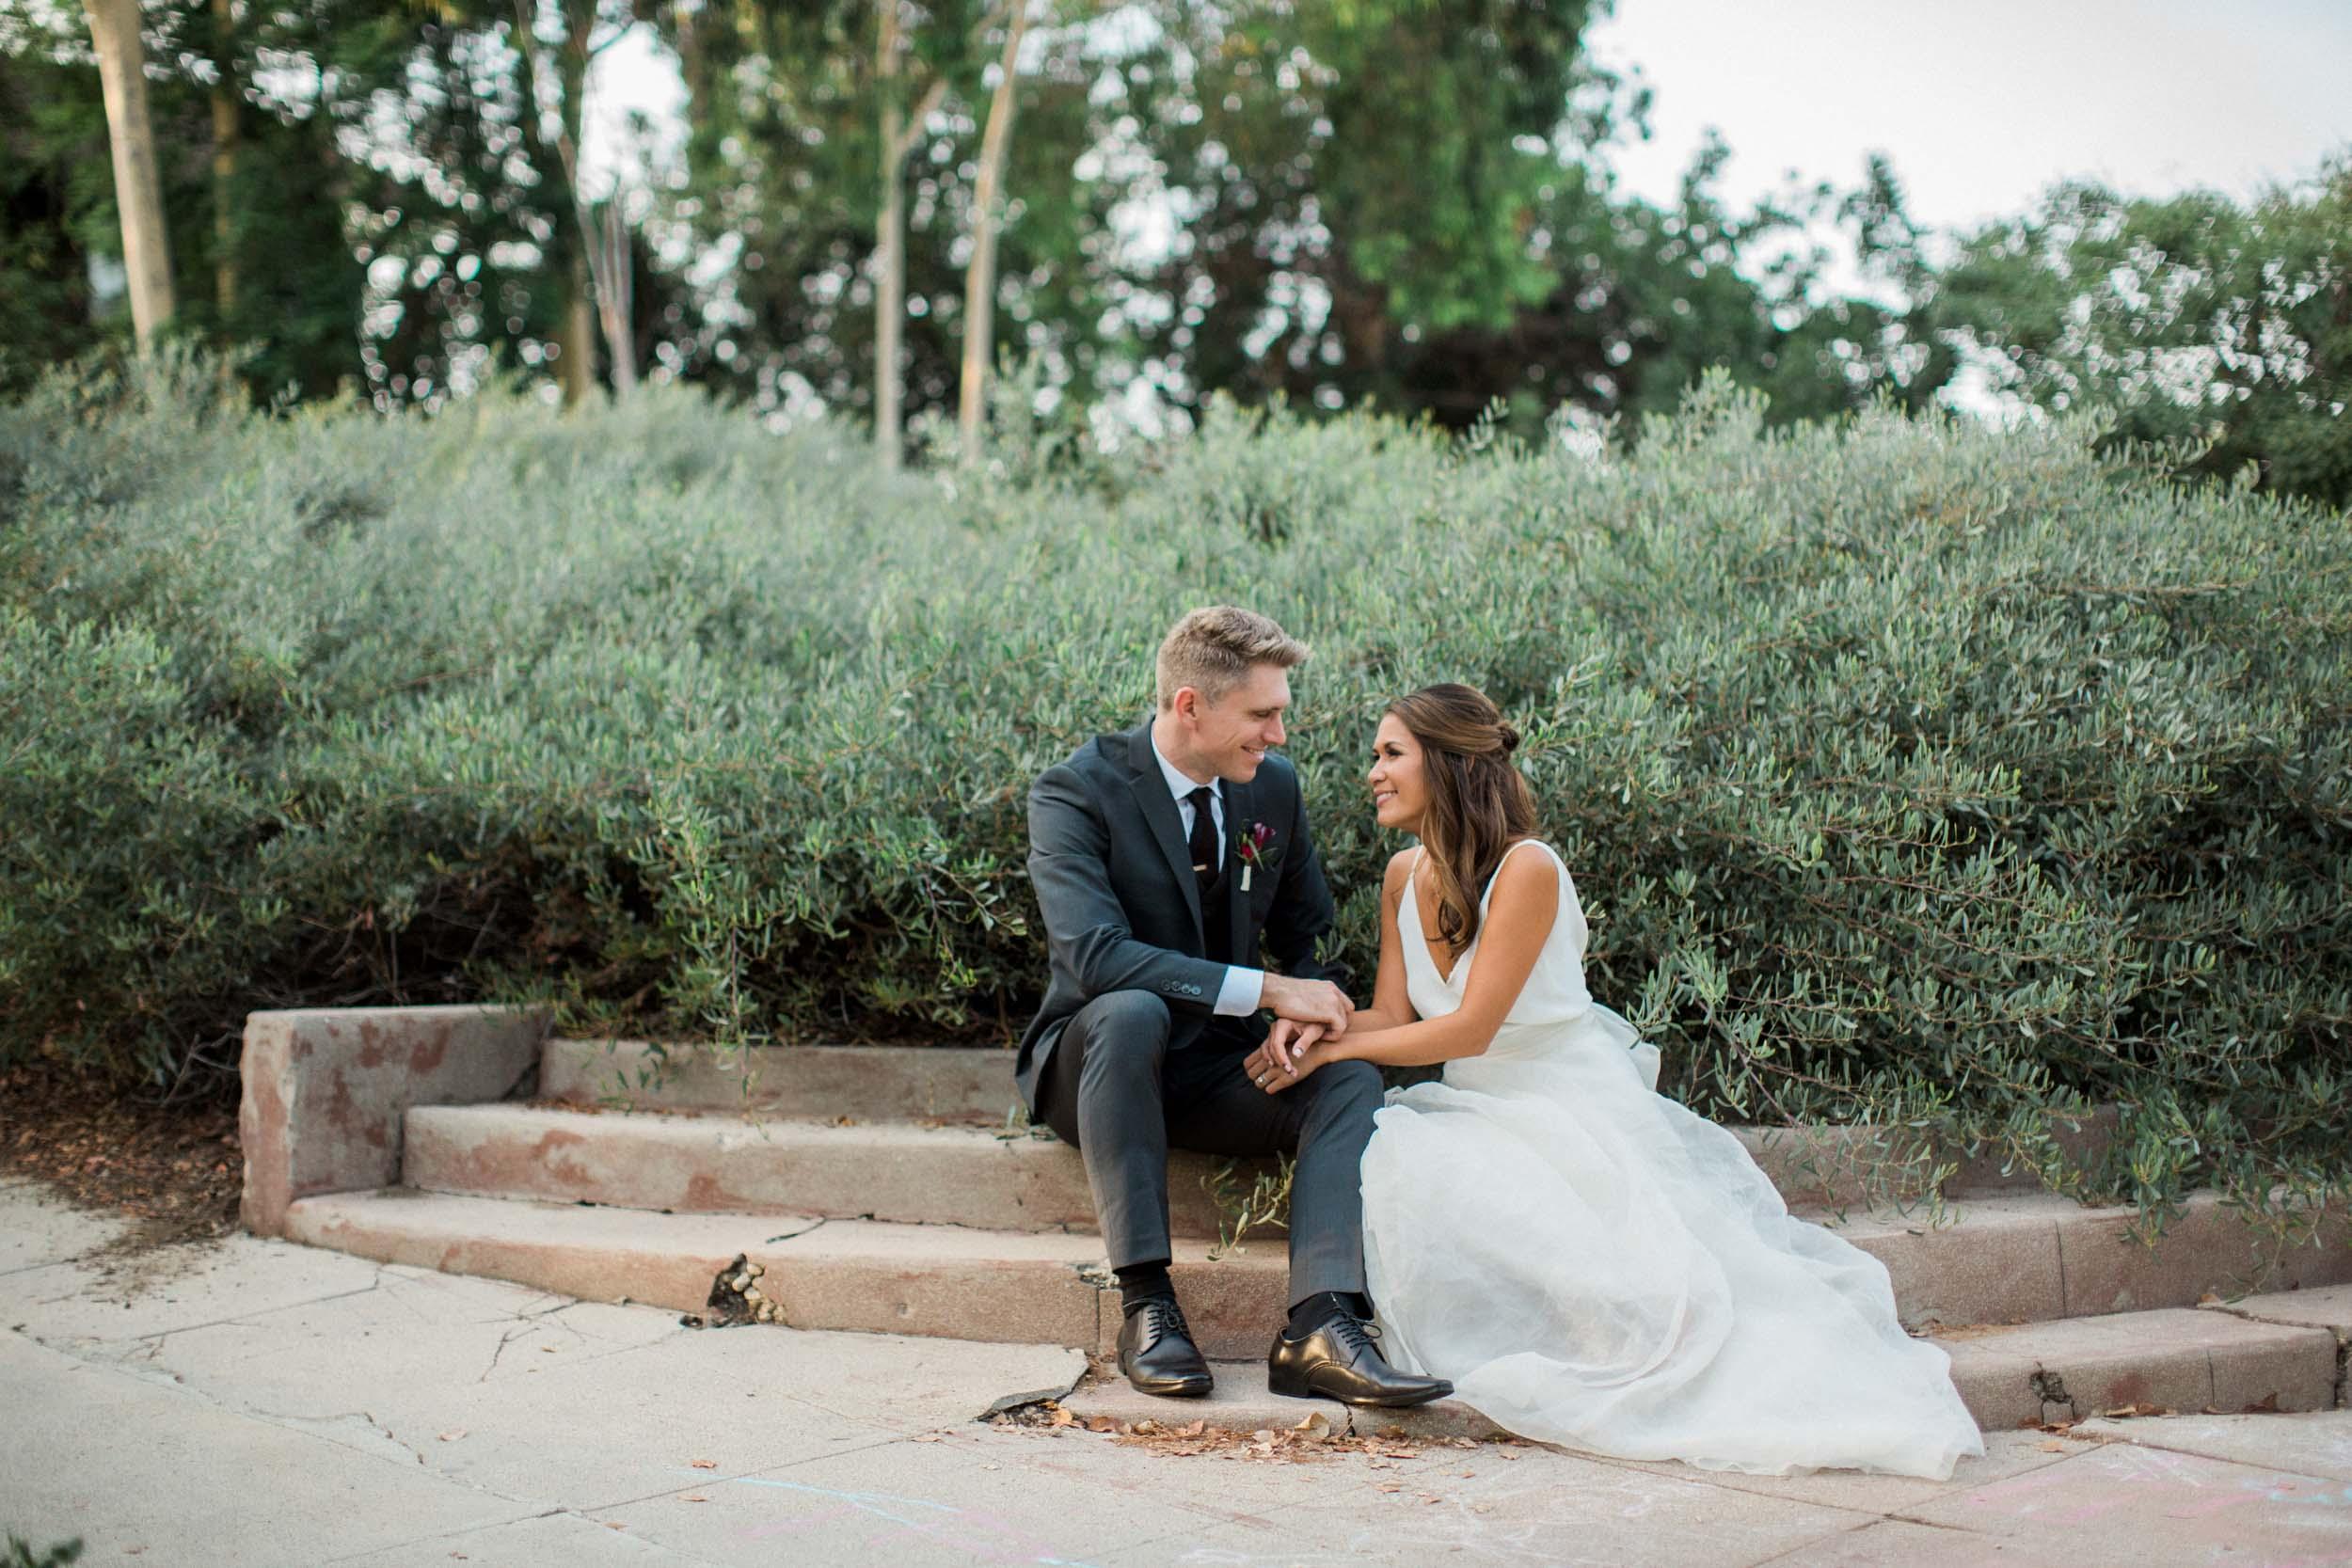 BKM-Photography-Highland-Park-Los-Angeles-Backyard-Wedding-0042.jpg